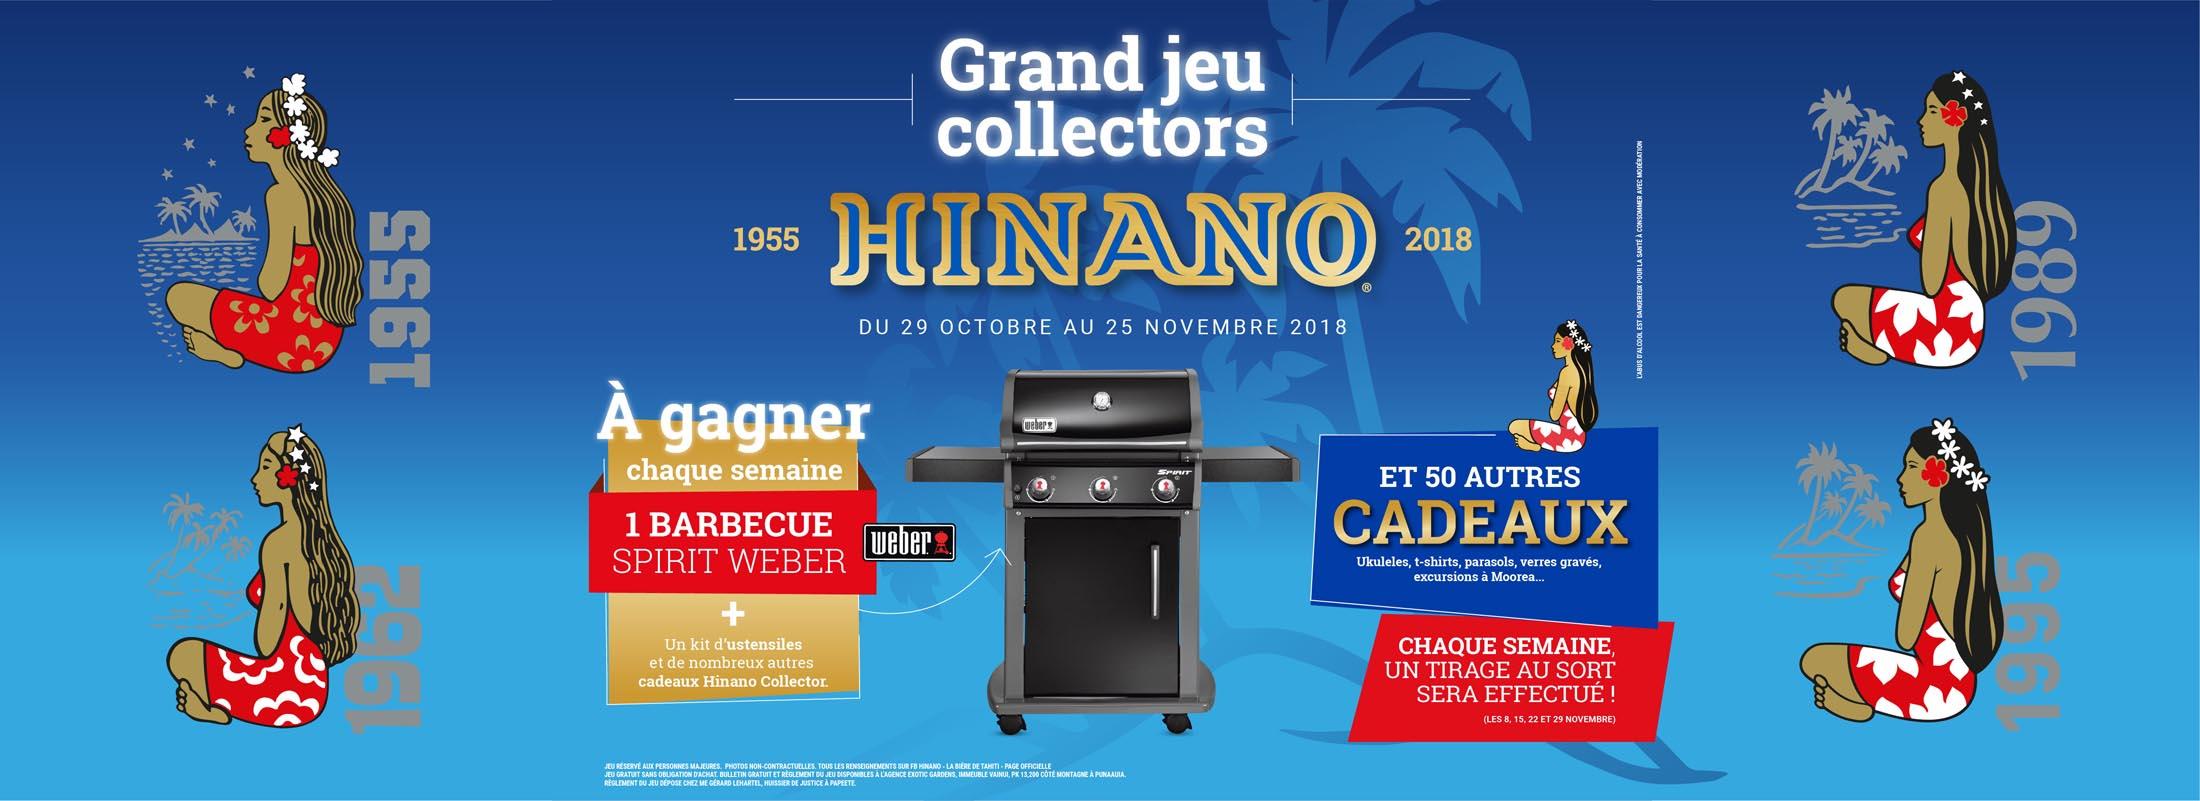 HINANO-JEU-2200X800-SITE-HINANO-BD